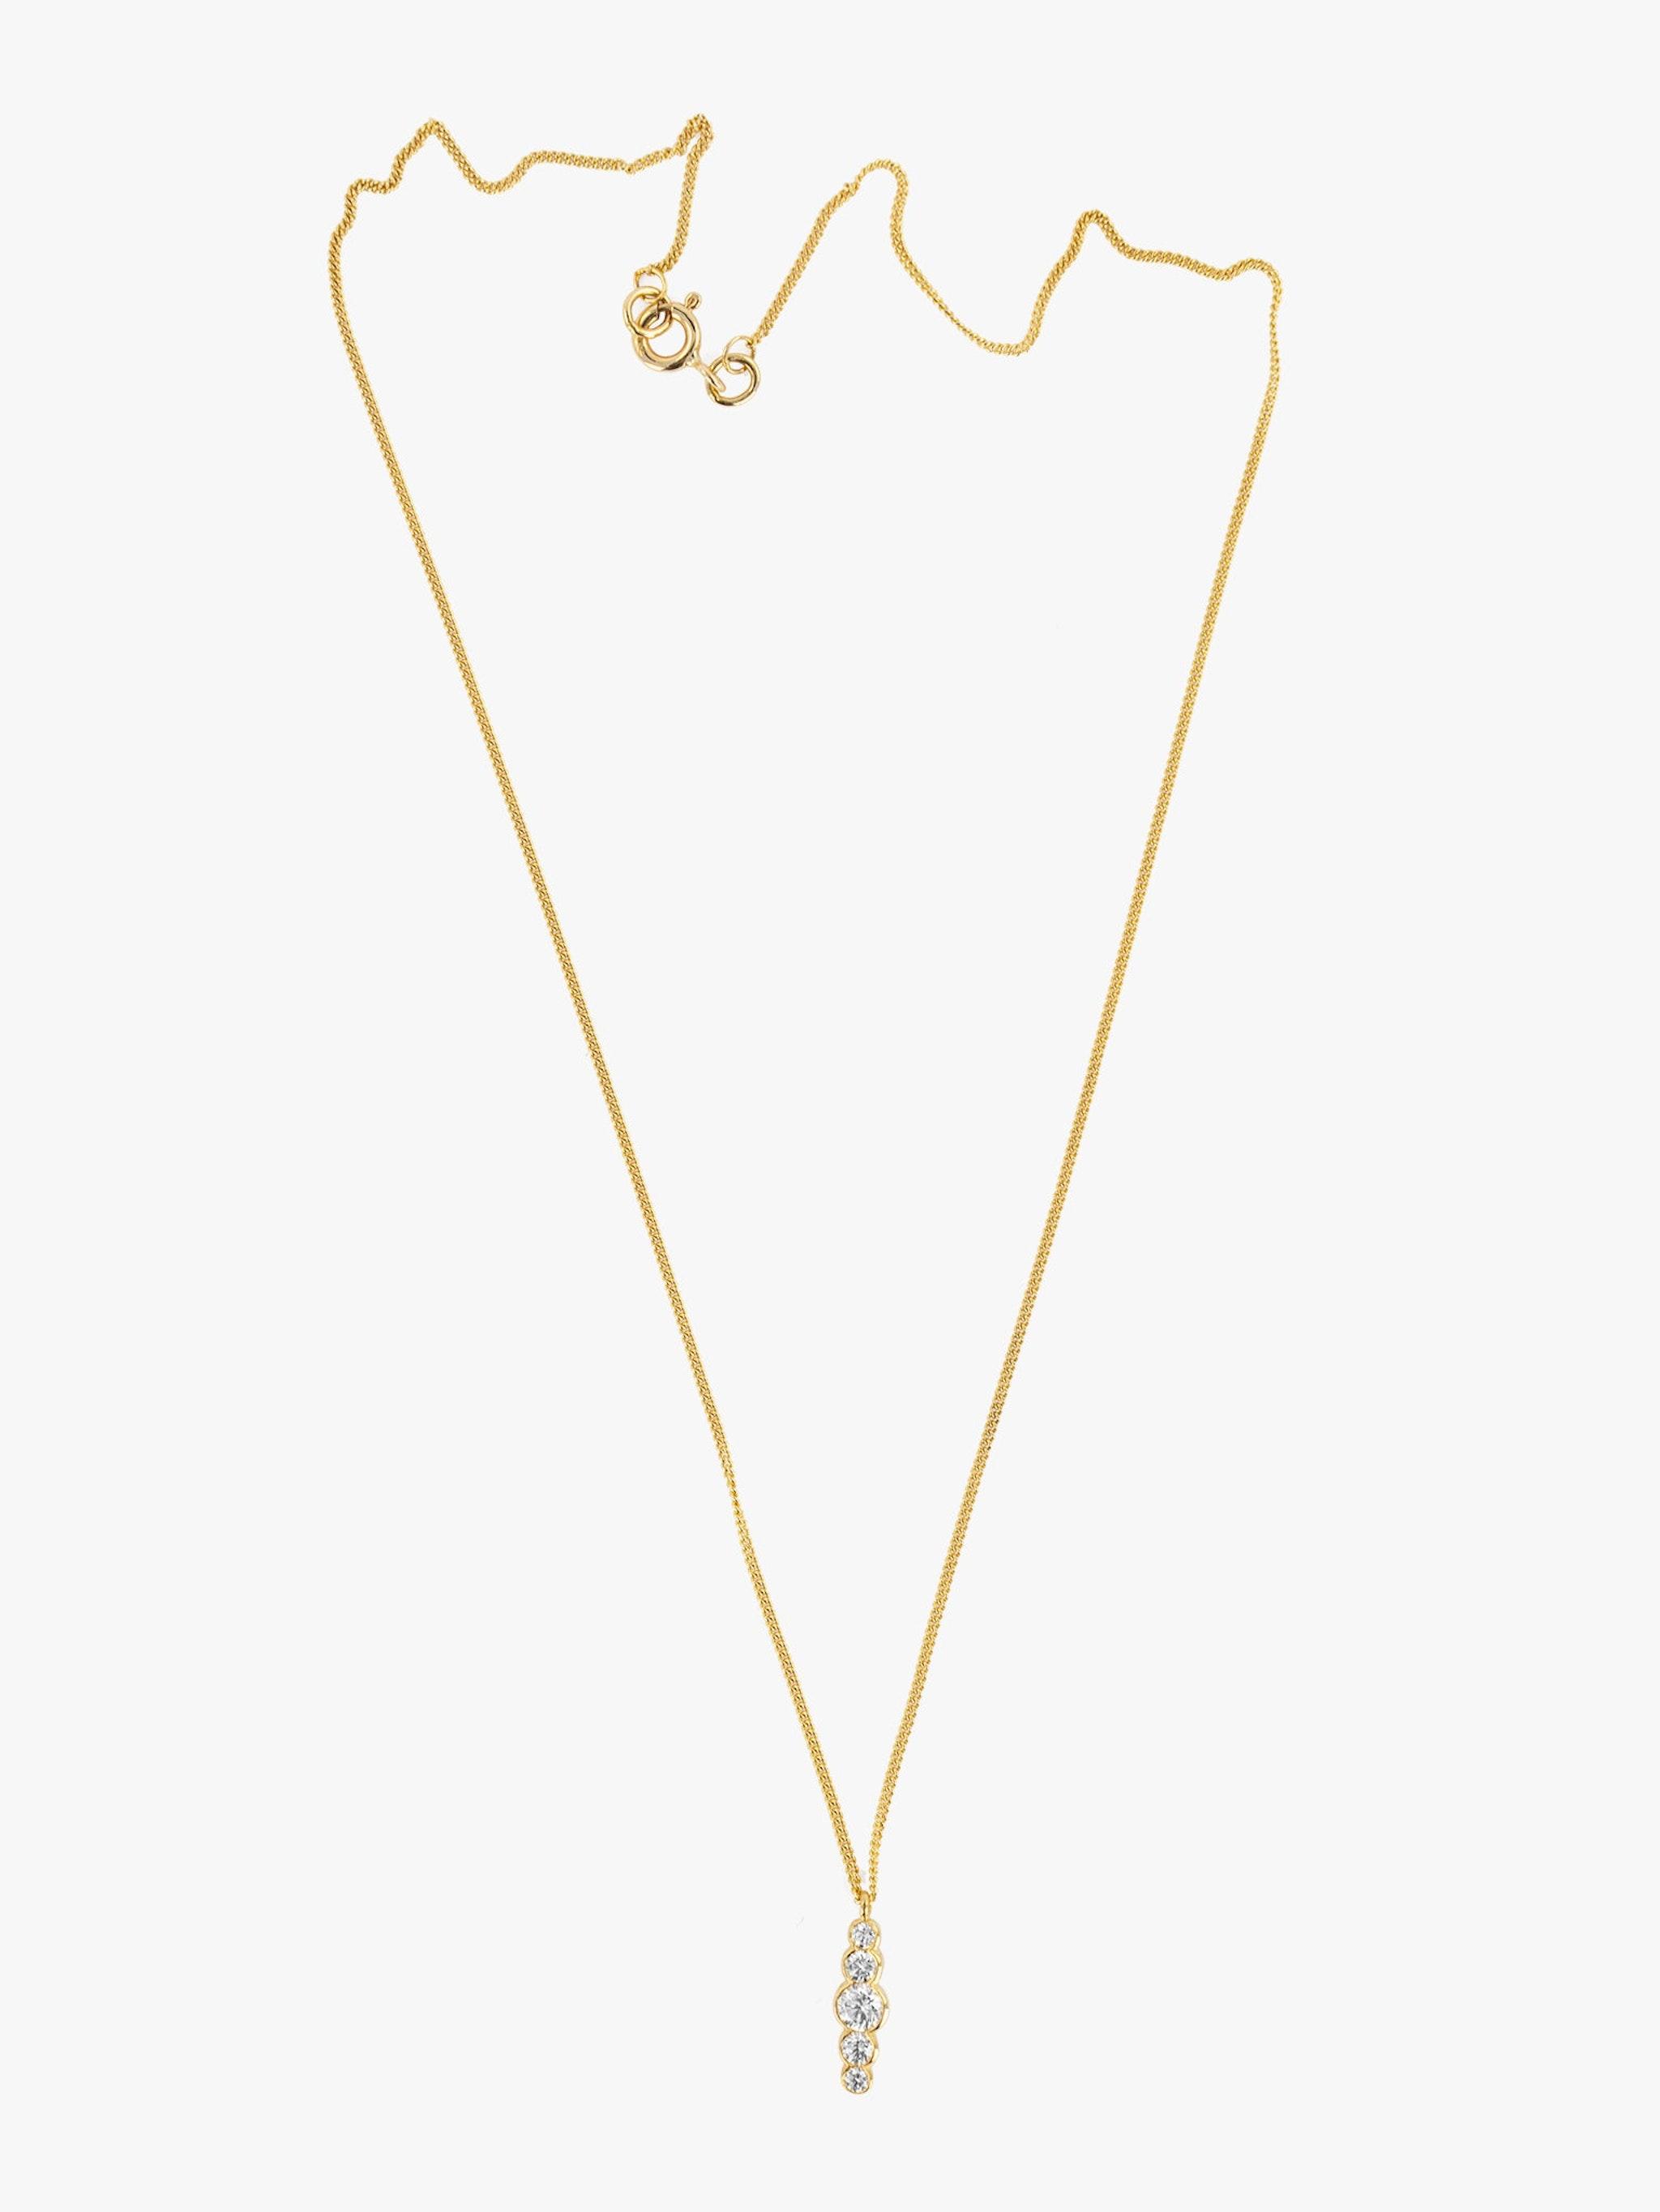 Scallop diamond necklace photo 1